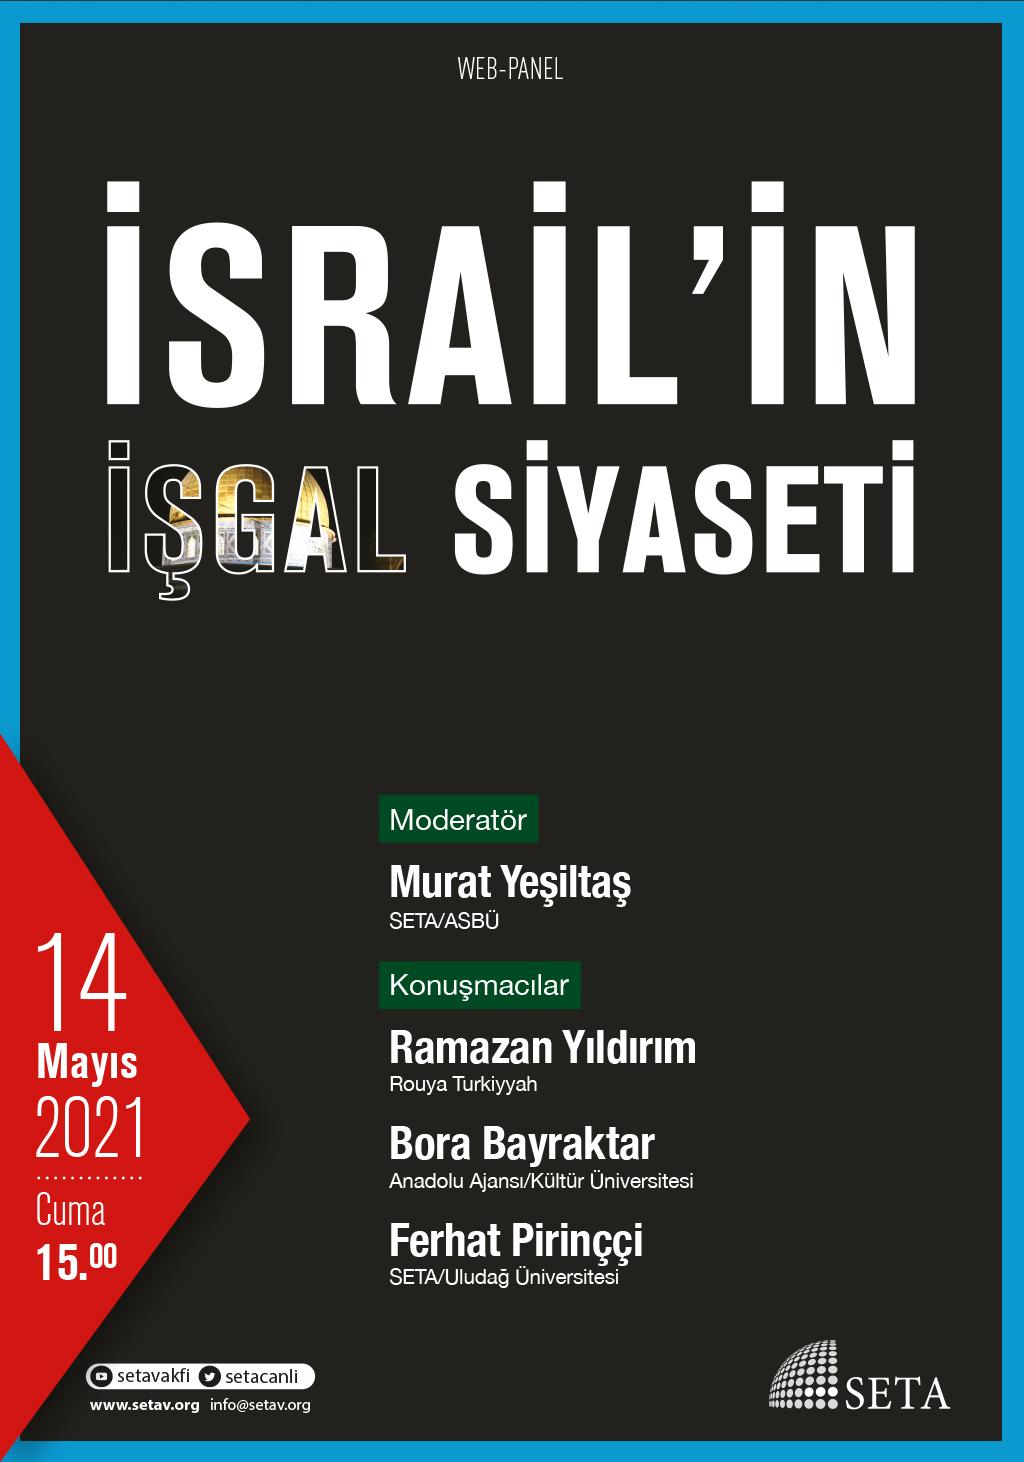 Web Panel: İsrail'in İşgal Siyaseti